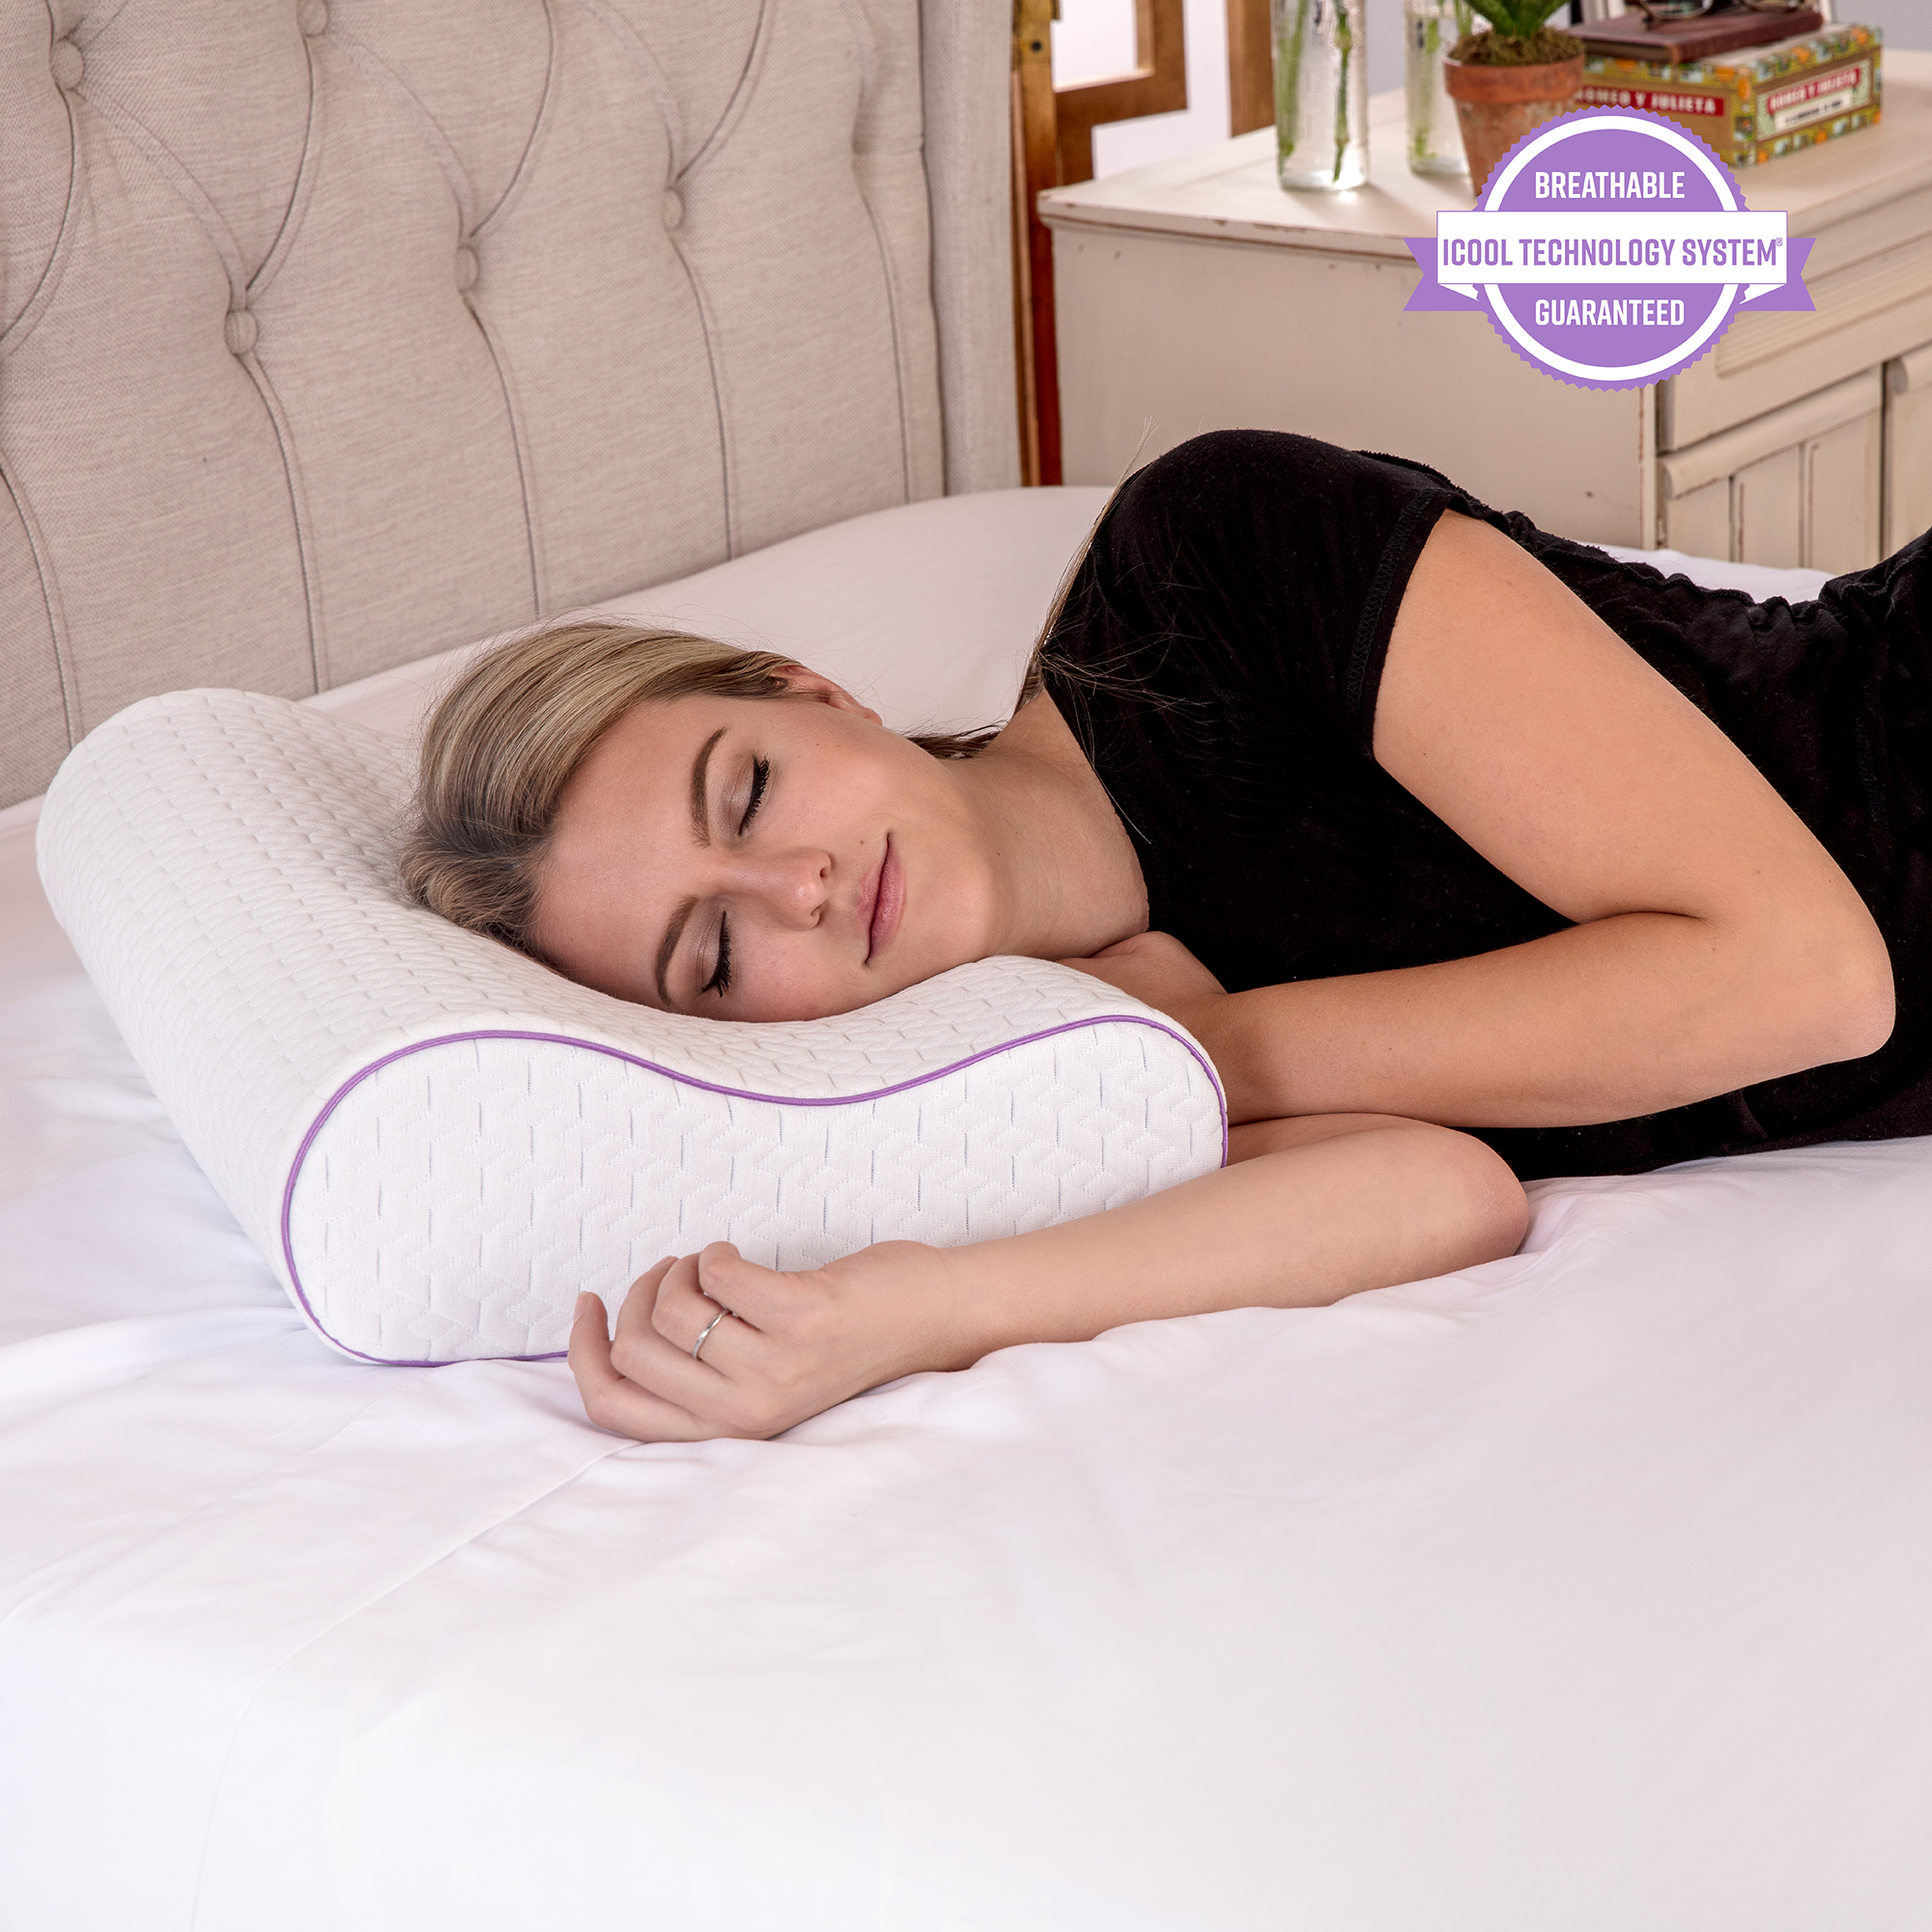 sensorpedic temperature regulating coolest comfort contour memory foam bed pillow walmart com